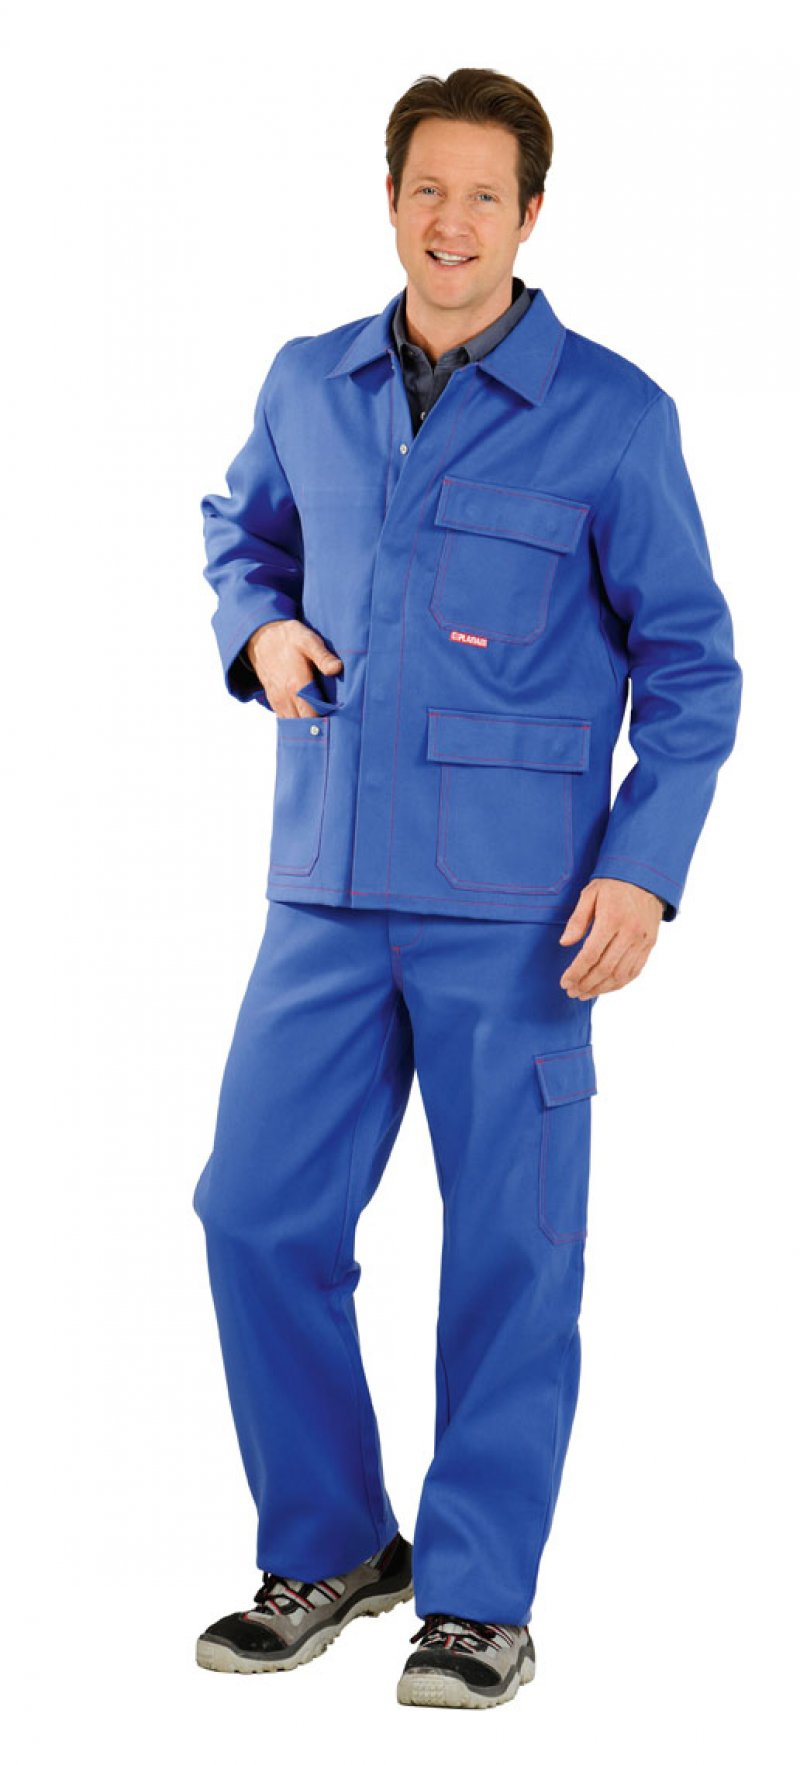 Jacheta de sudare, albastru regal, 360g / mp ,42-64